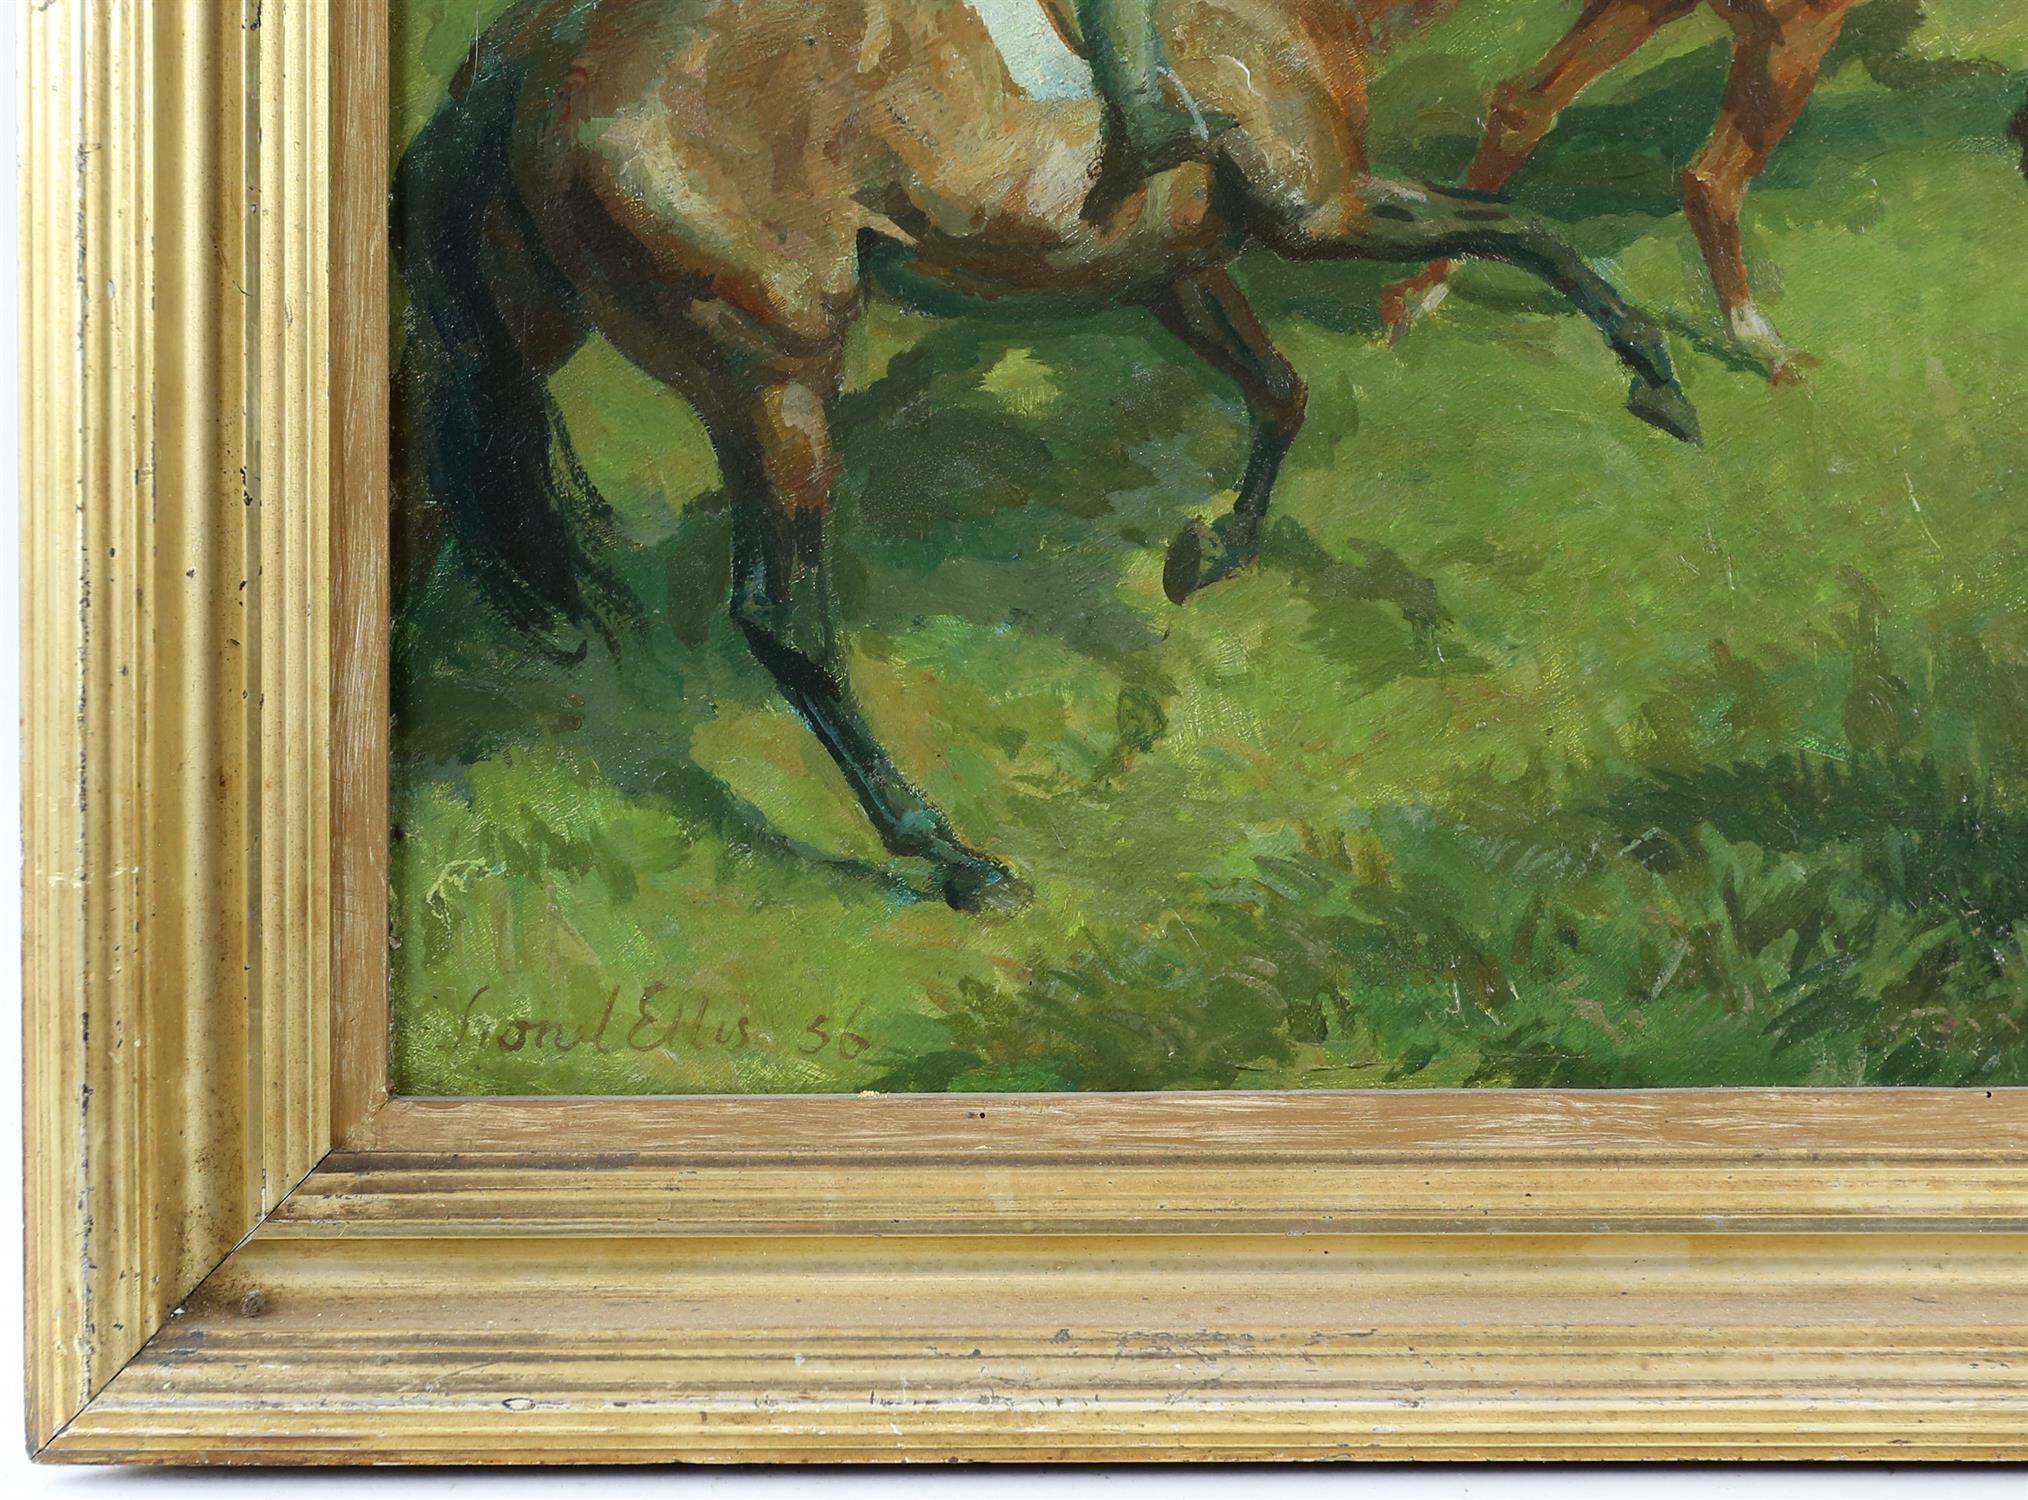 § Lionel Ellis (1903-1988) Horsemen on a hillside. Oil in board 1956, signed and dated lower left. - Image 3 of 4